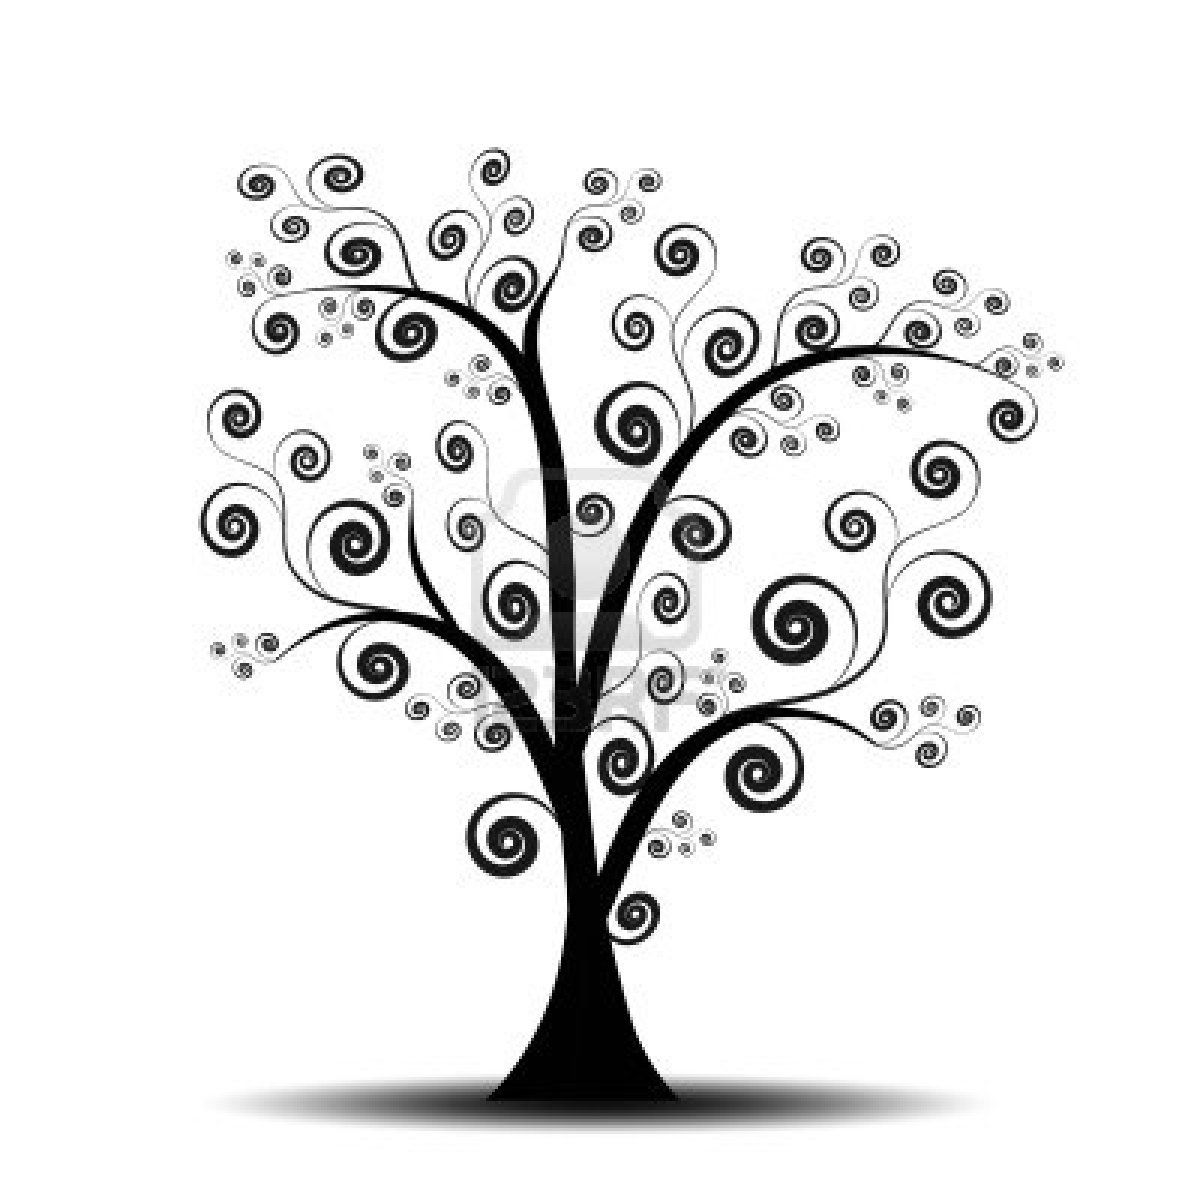 arbol dibujo ramas - Cerca amb Google | arbre genealogic | Pinterest ...